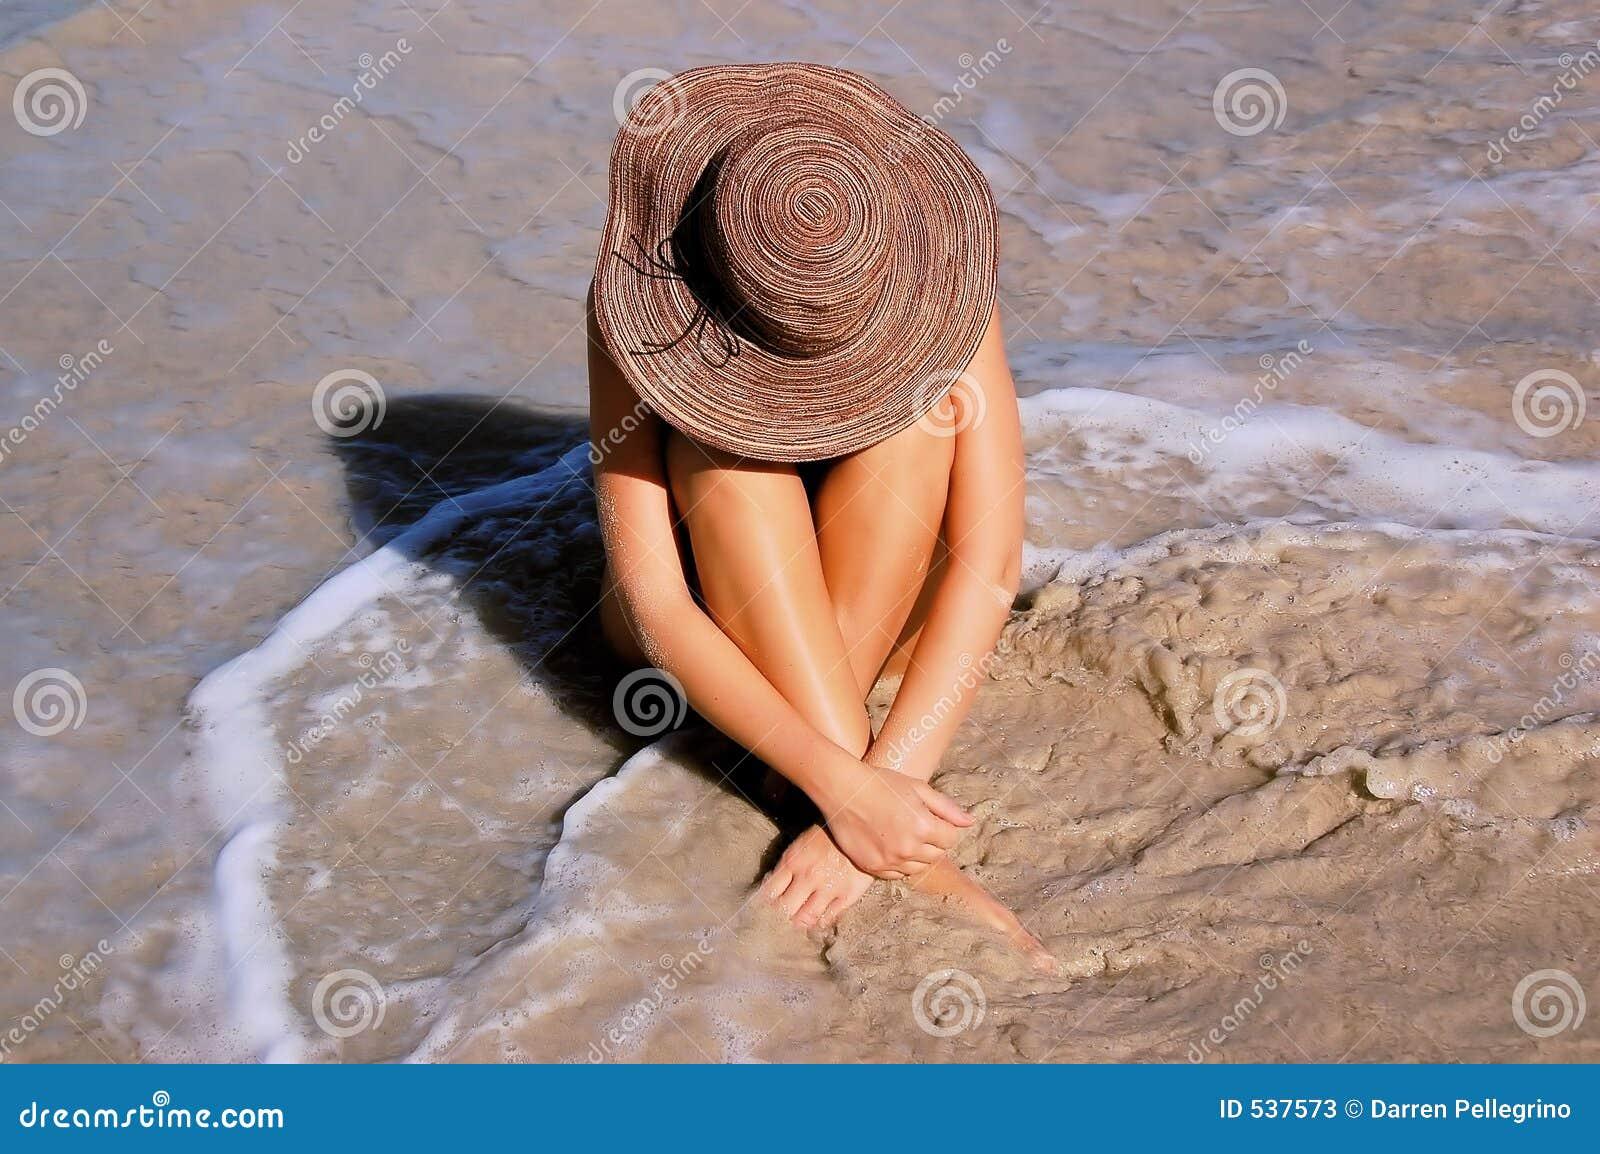 Download 海滩妇女 库存图片. 图片 包括有 女性, 晒裂, 热带, 放松, 雍容, 女孩, 帽子, 设计, 表单, 妇女 - 537573